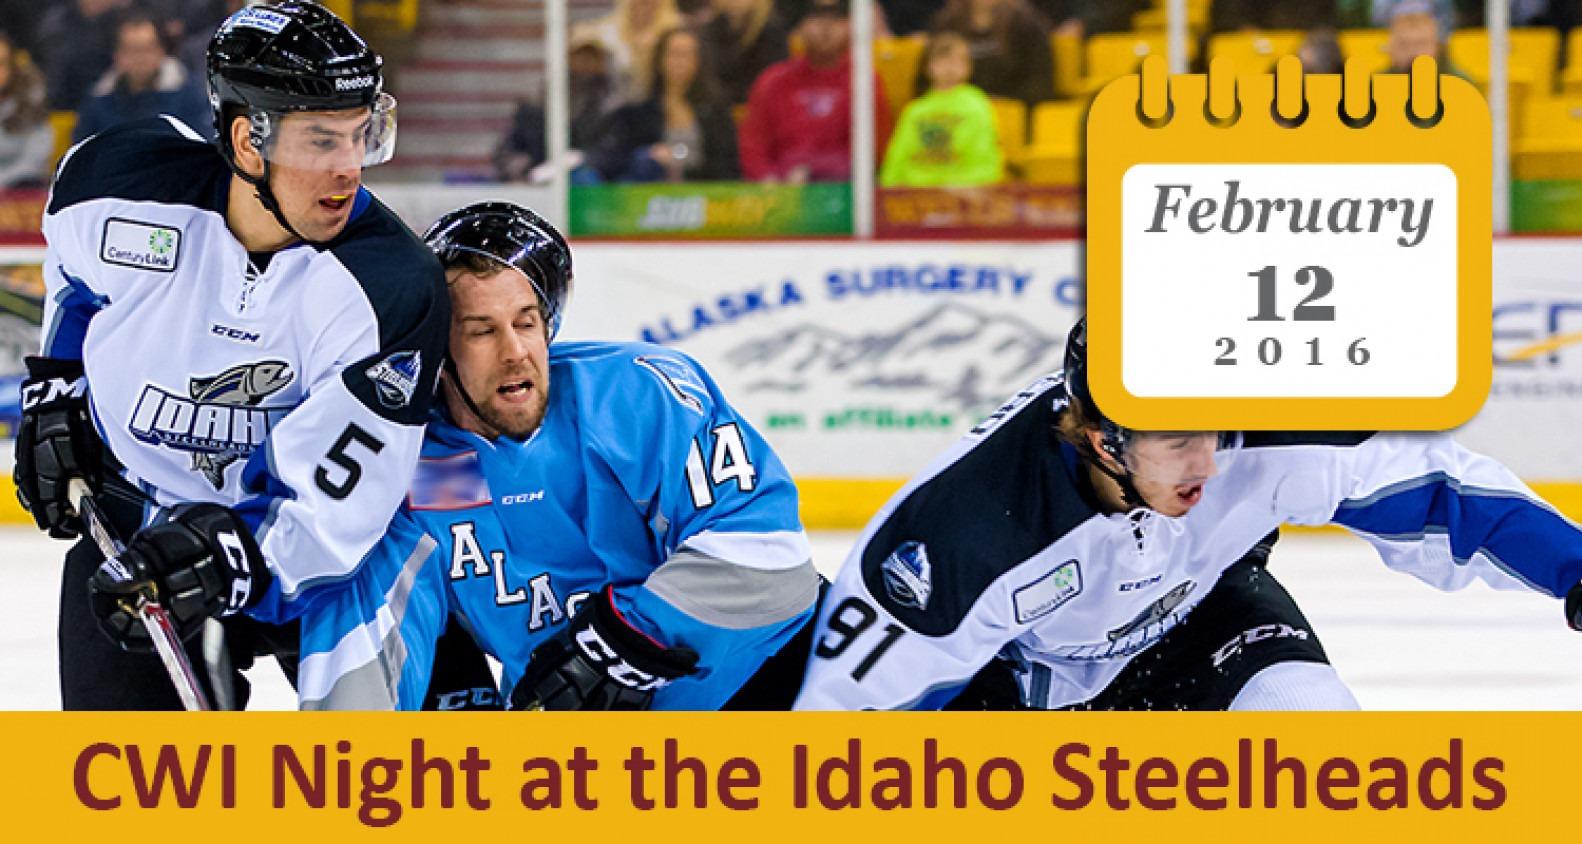 CWI Night at the Idaho Steelheads | Feb. 12, 2016